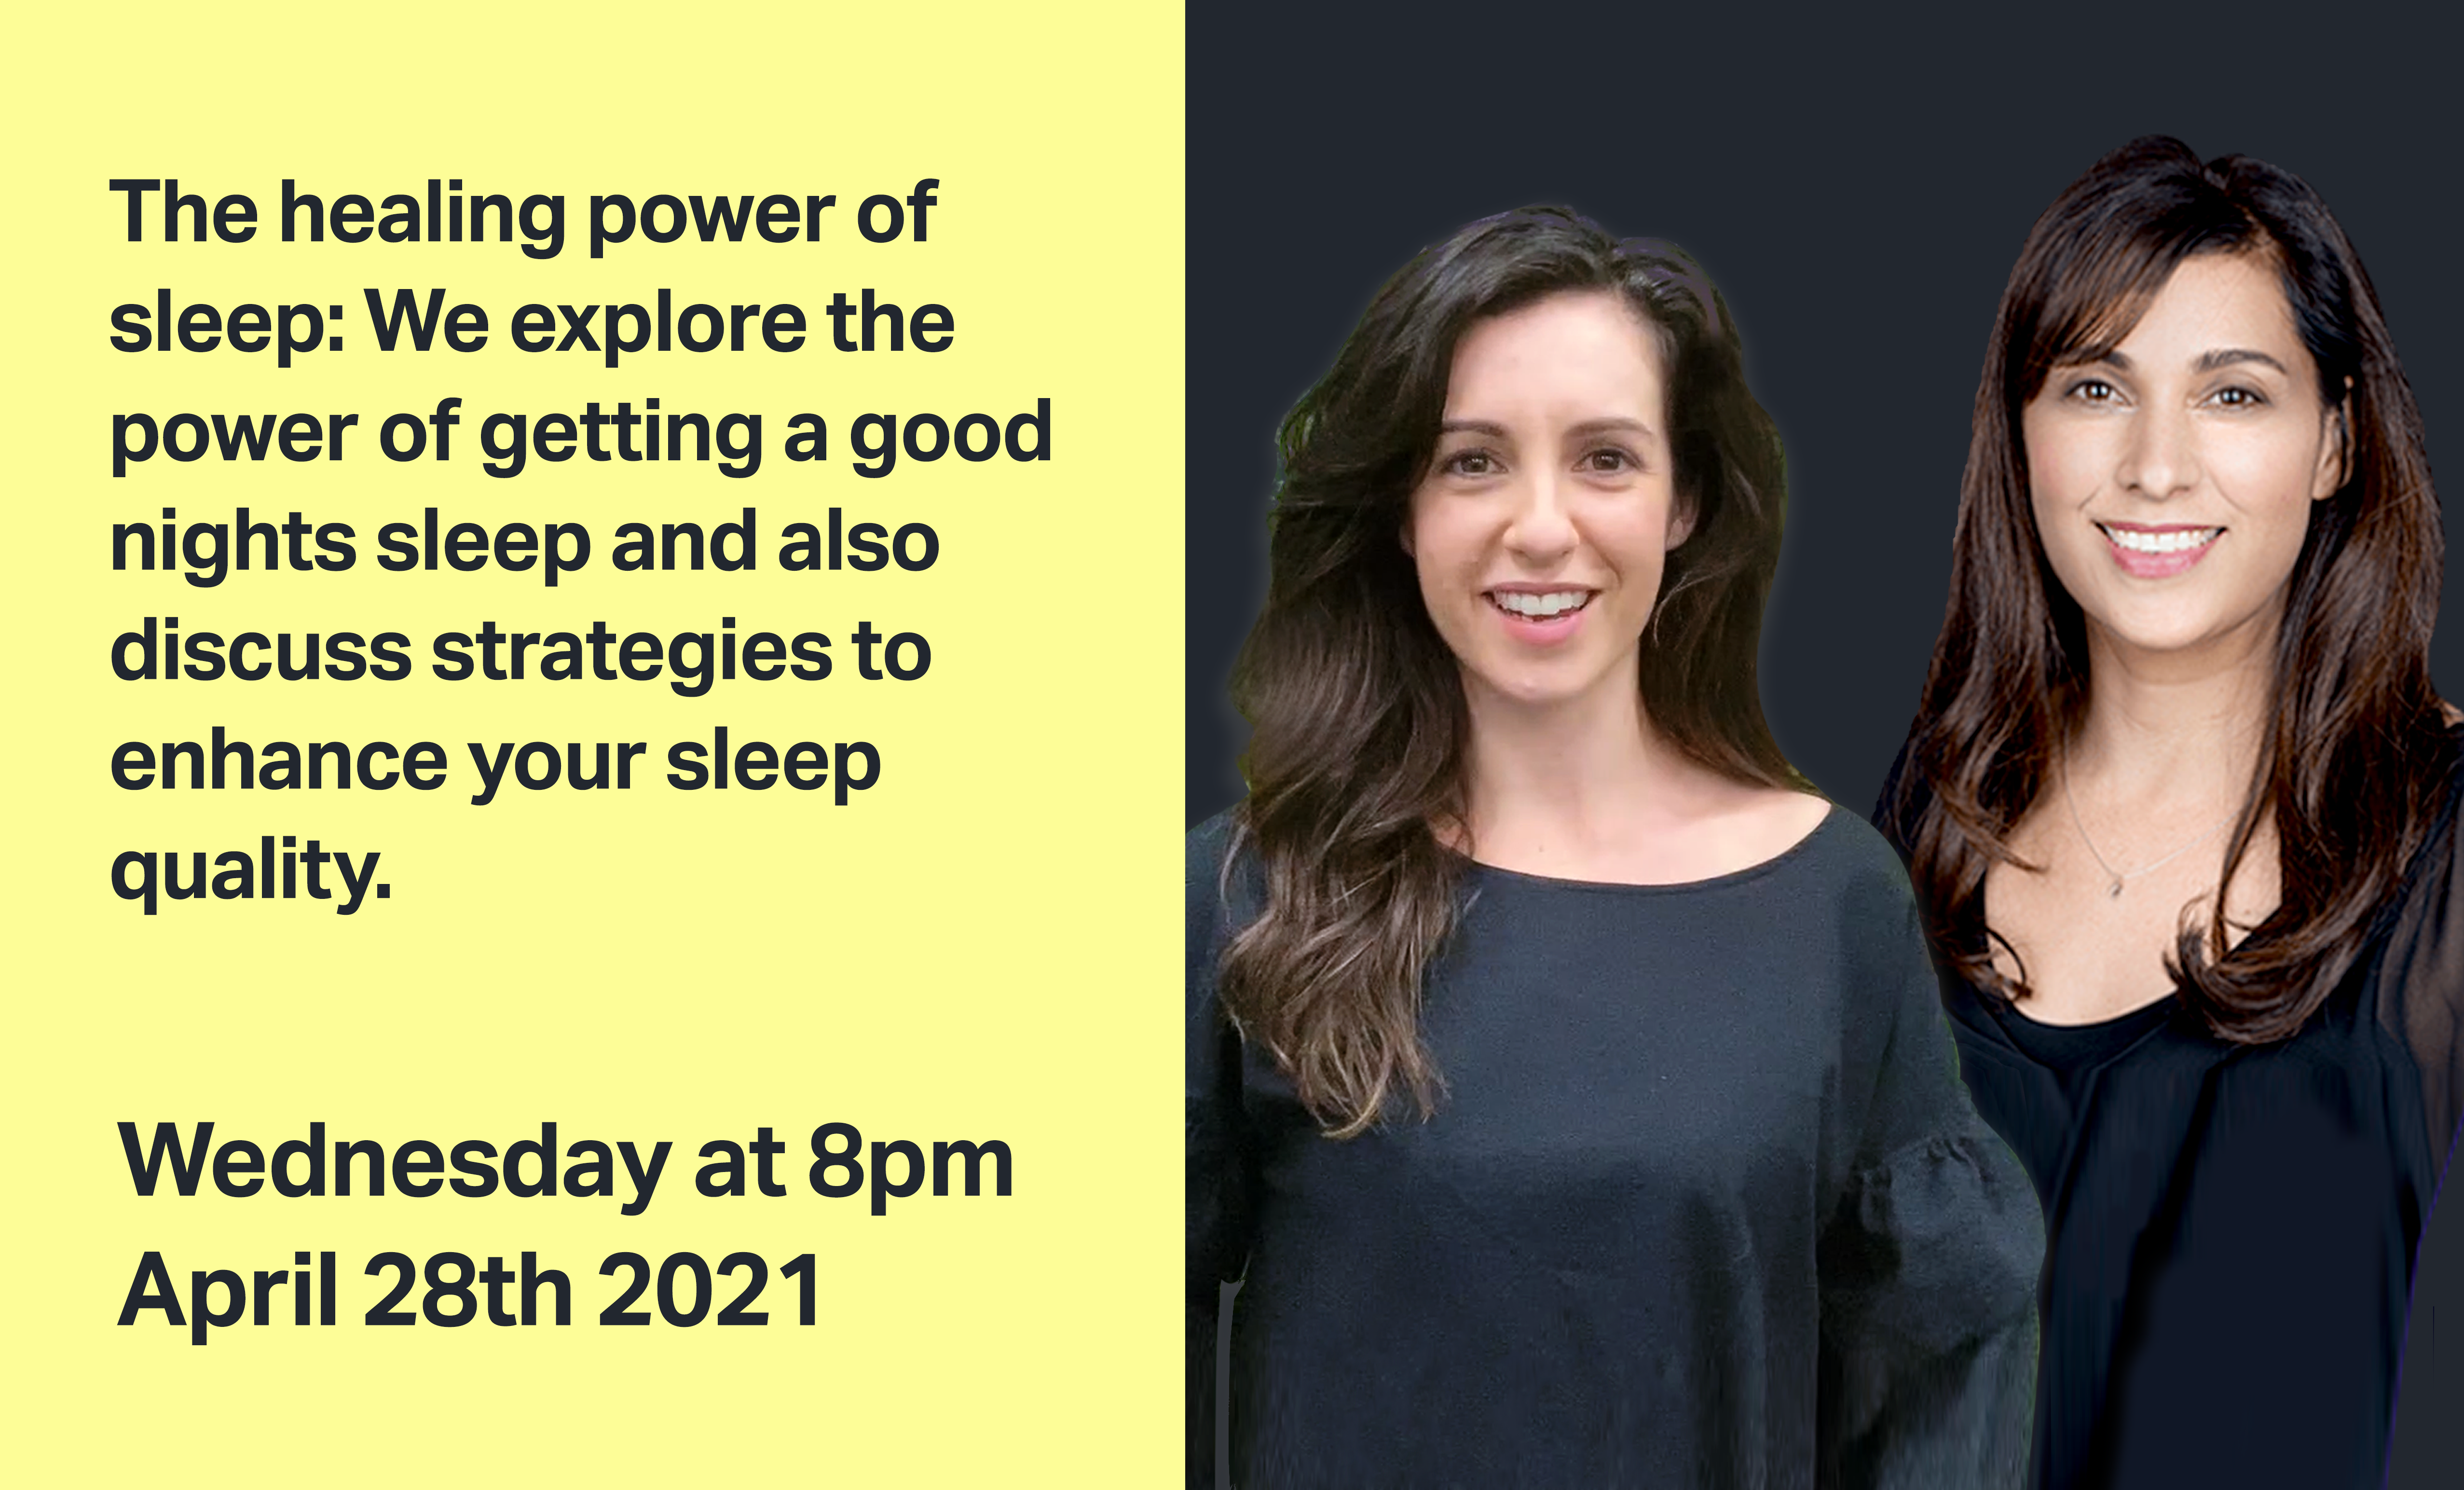 The healing power of sleep April 28th